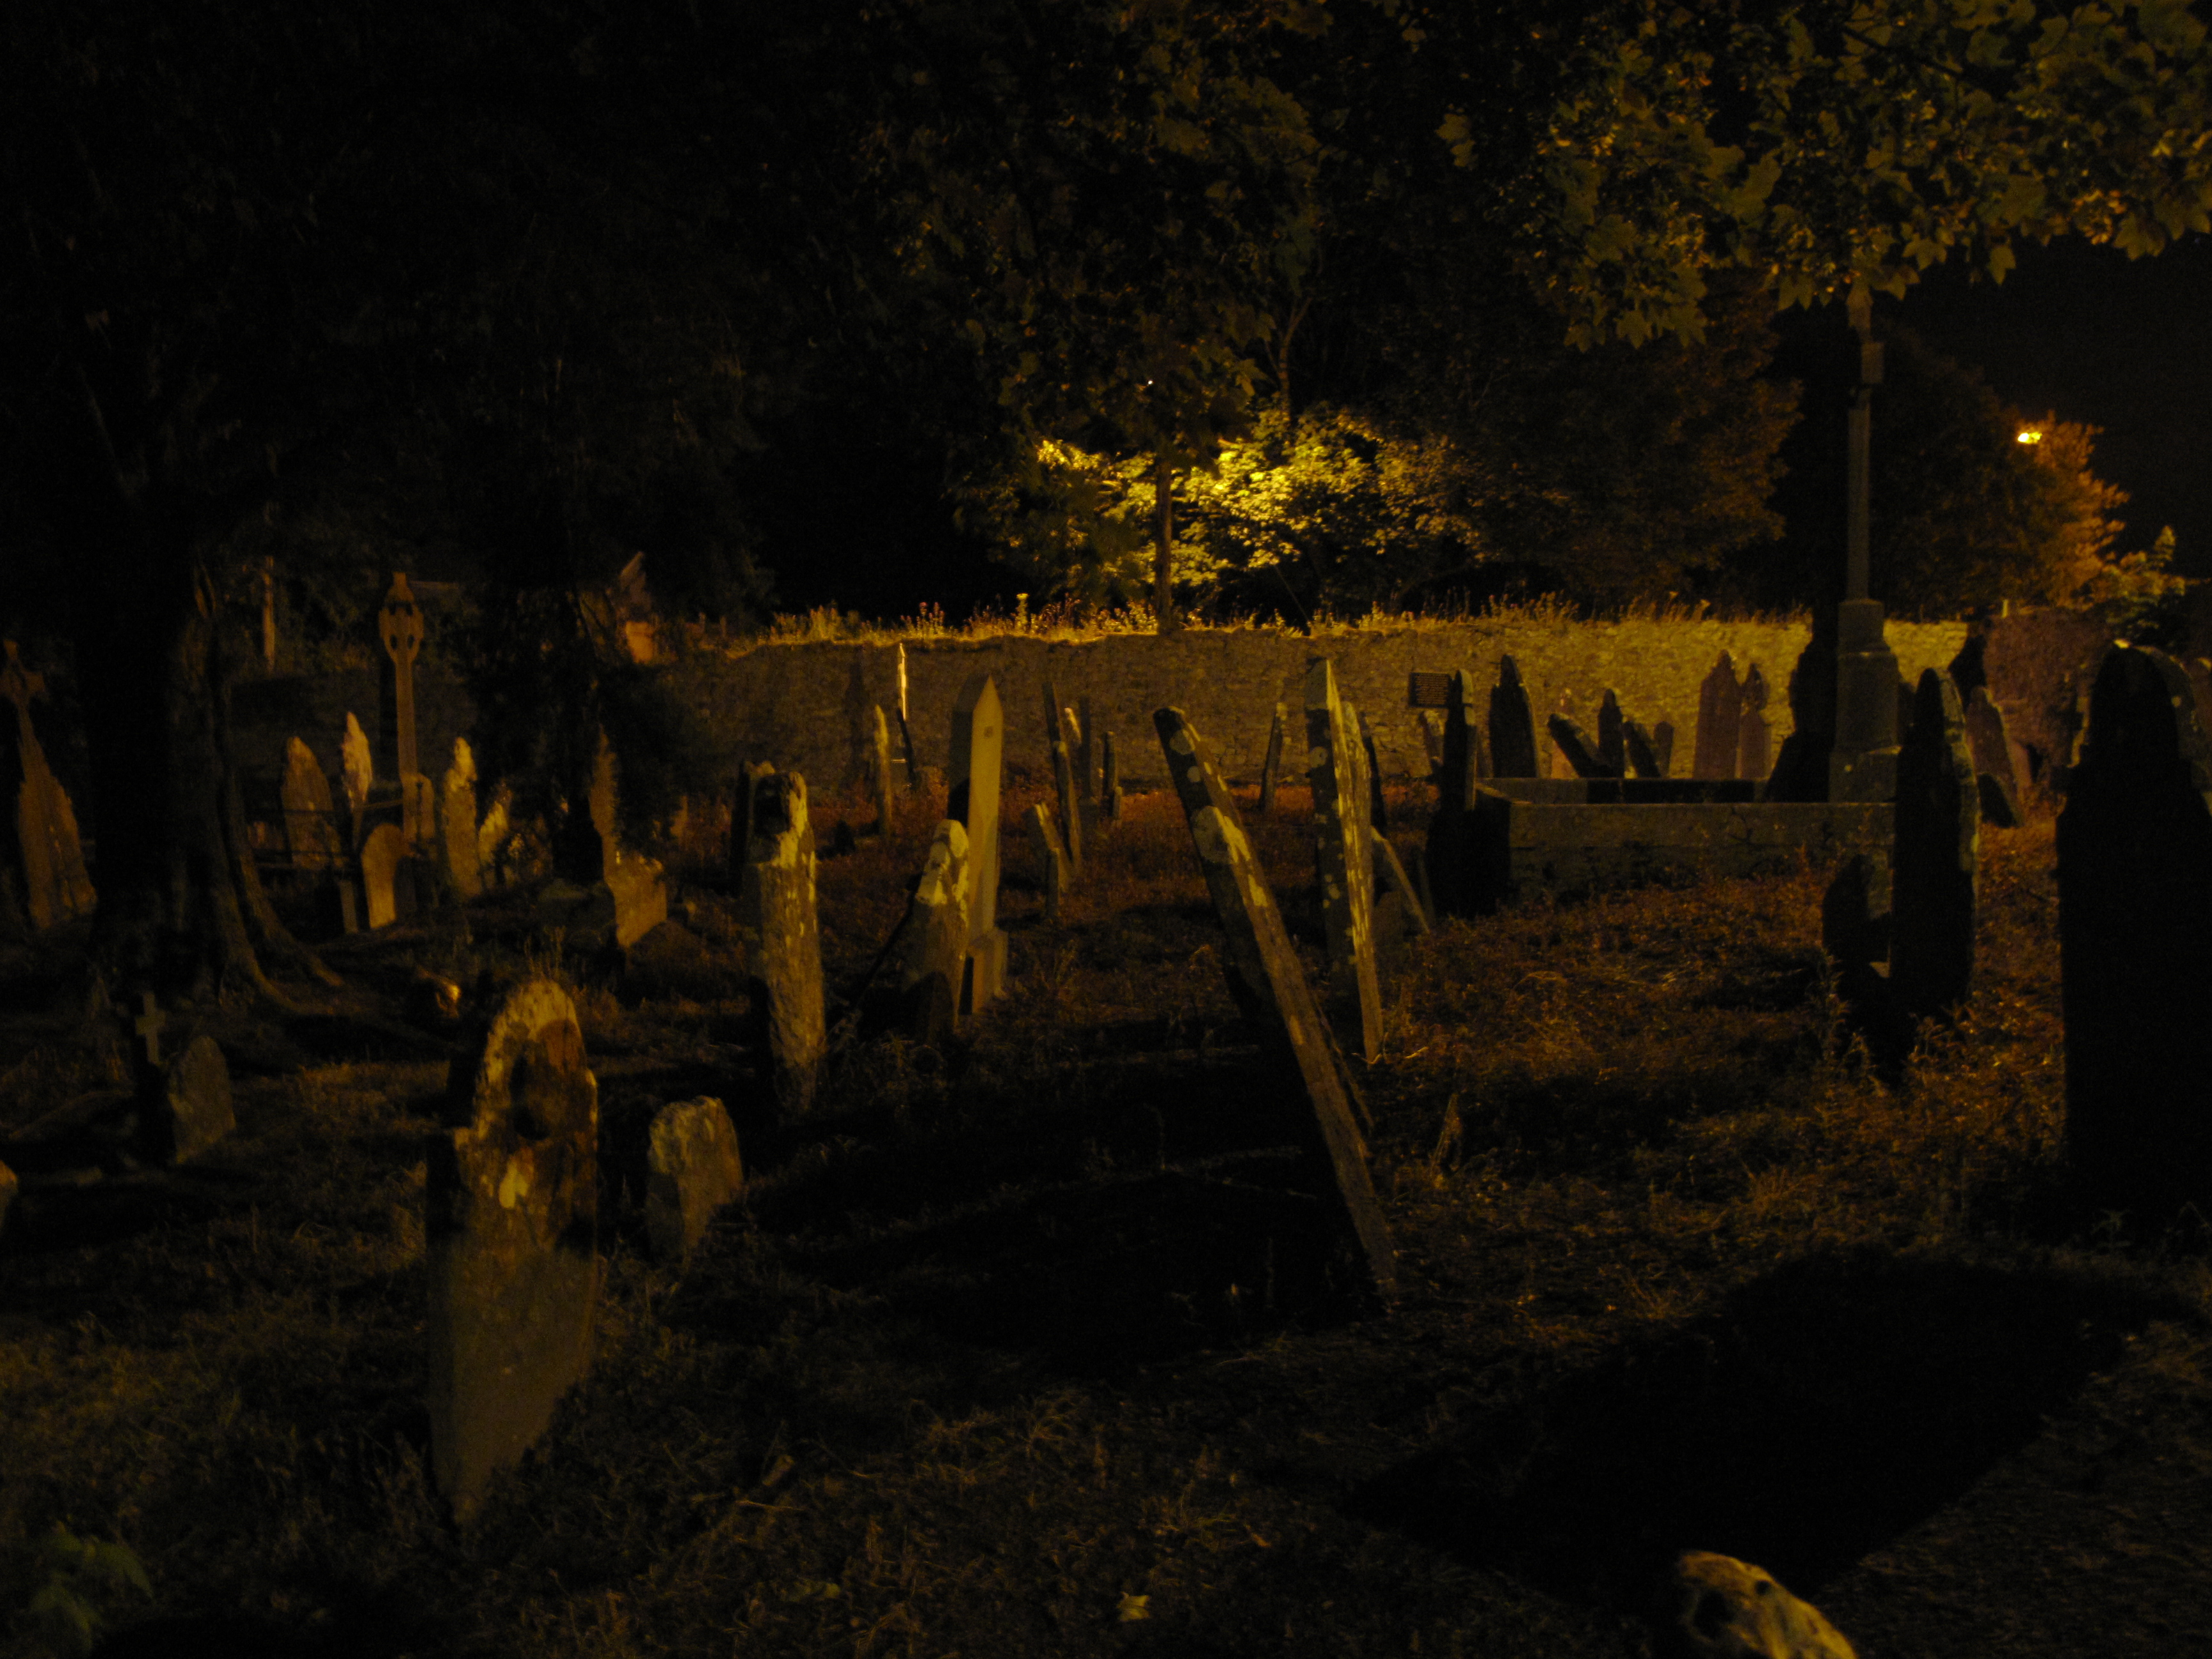 Graveyard at night wallpaper